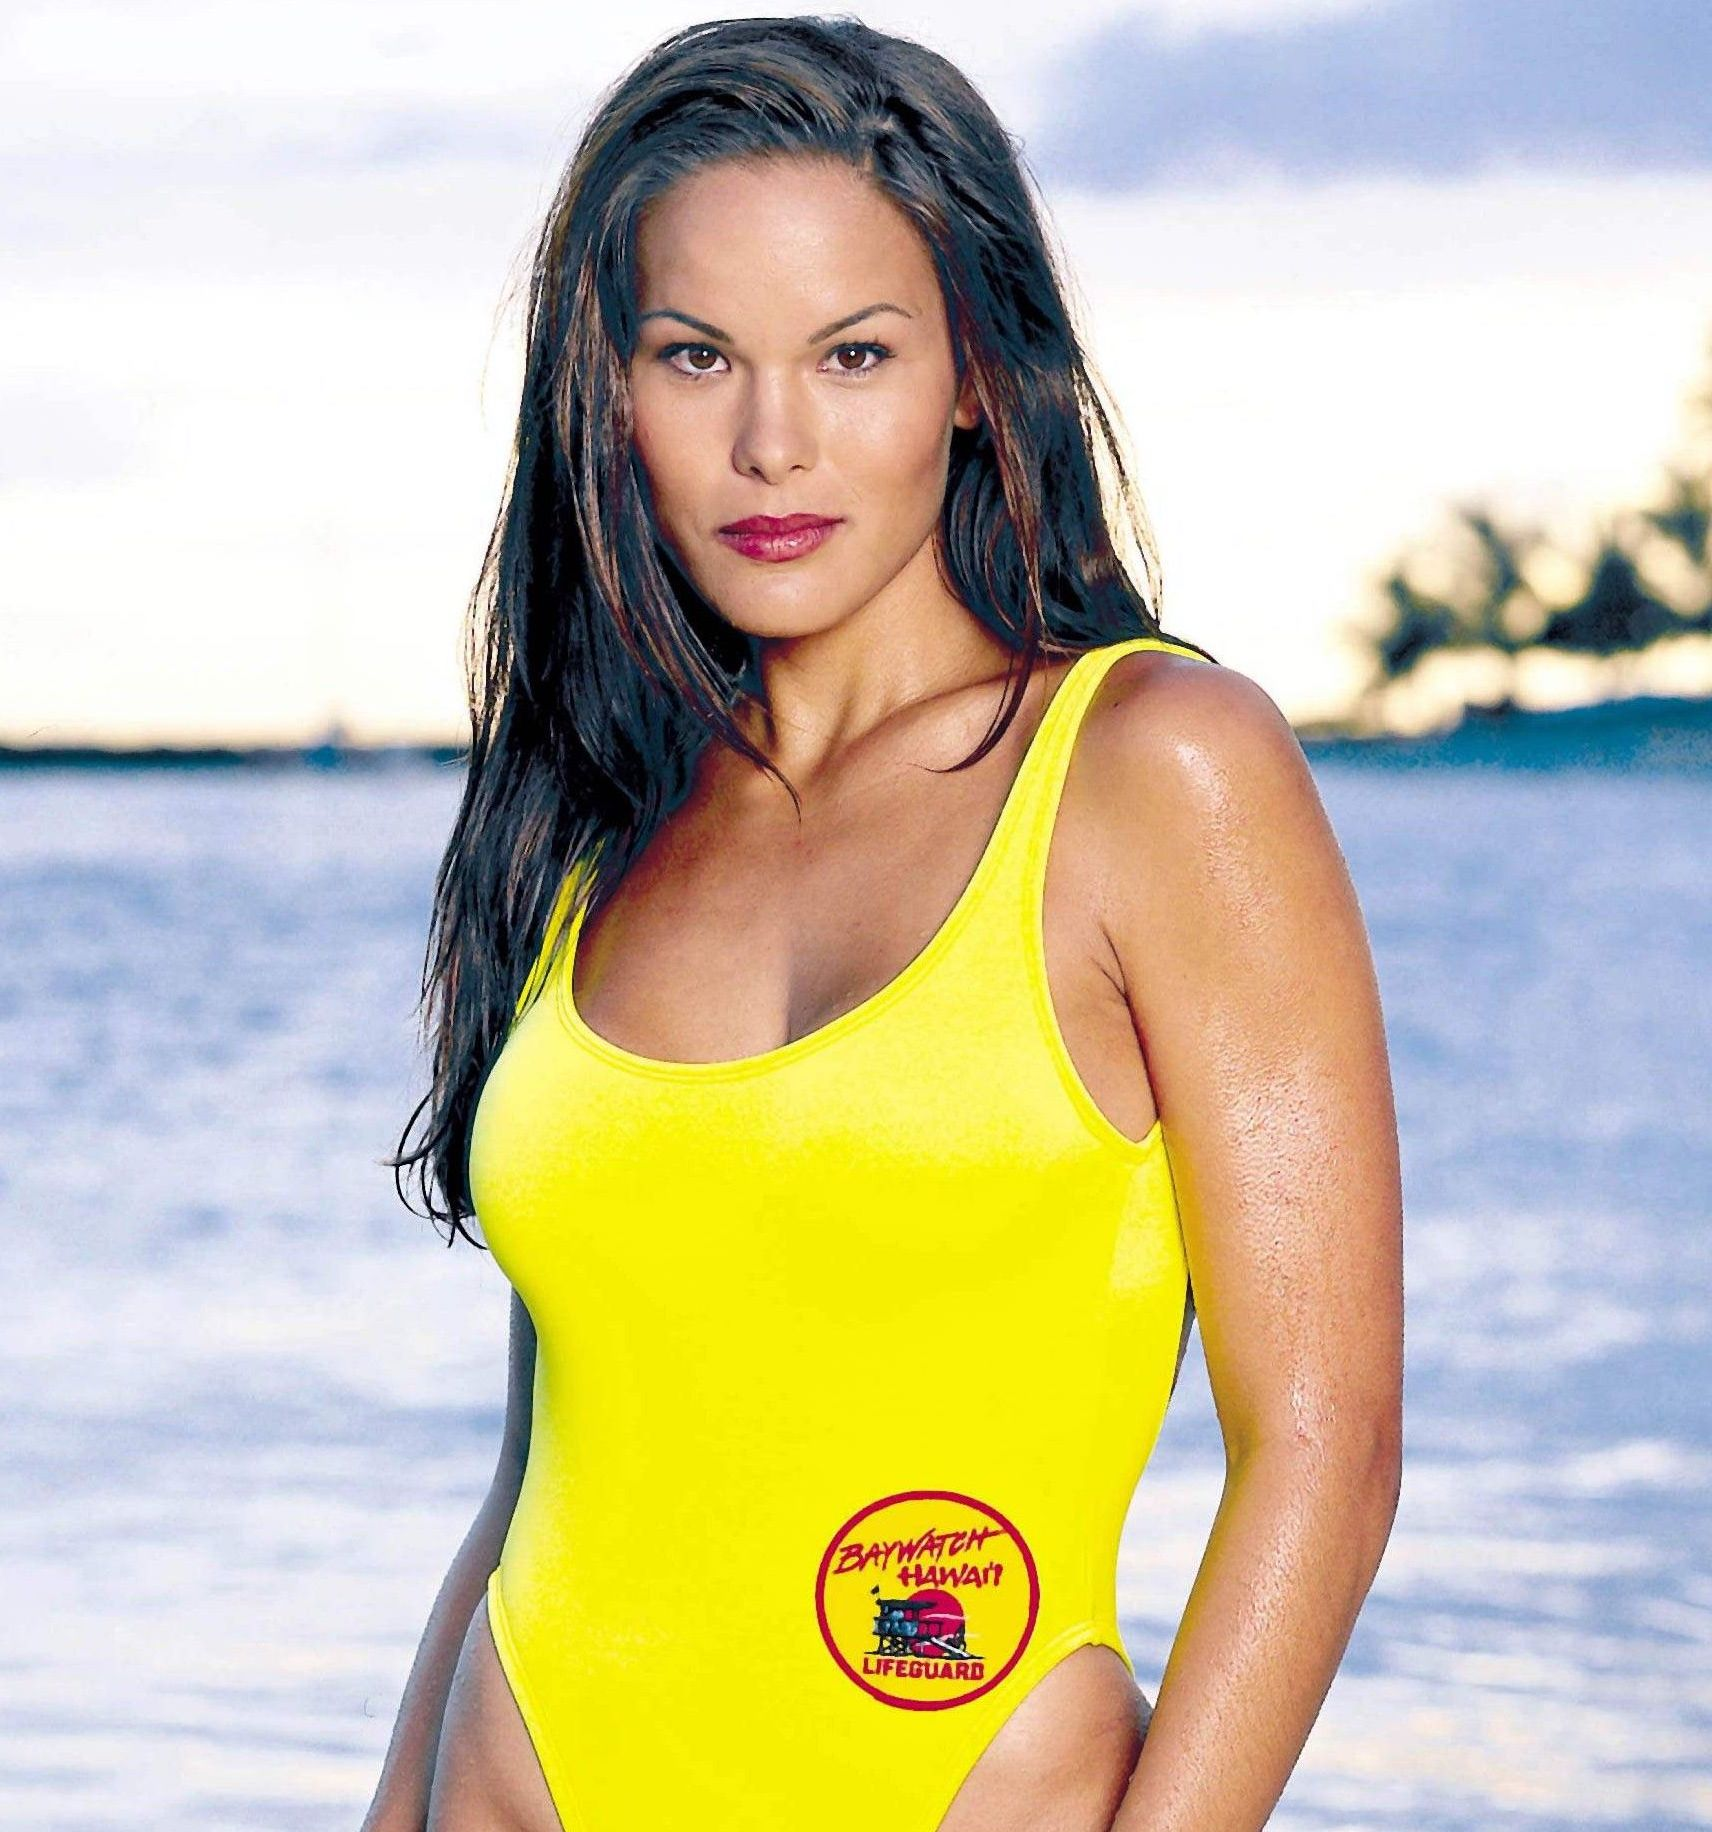 Stacy Kamanoas Kekoa Tanaka in Baywatch: Hawaii